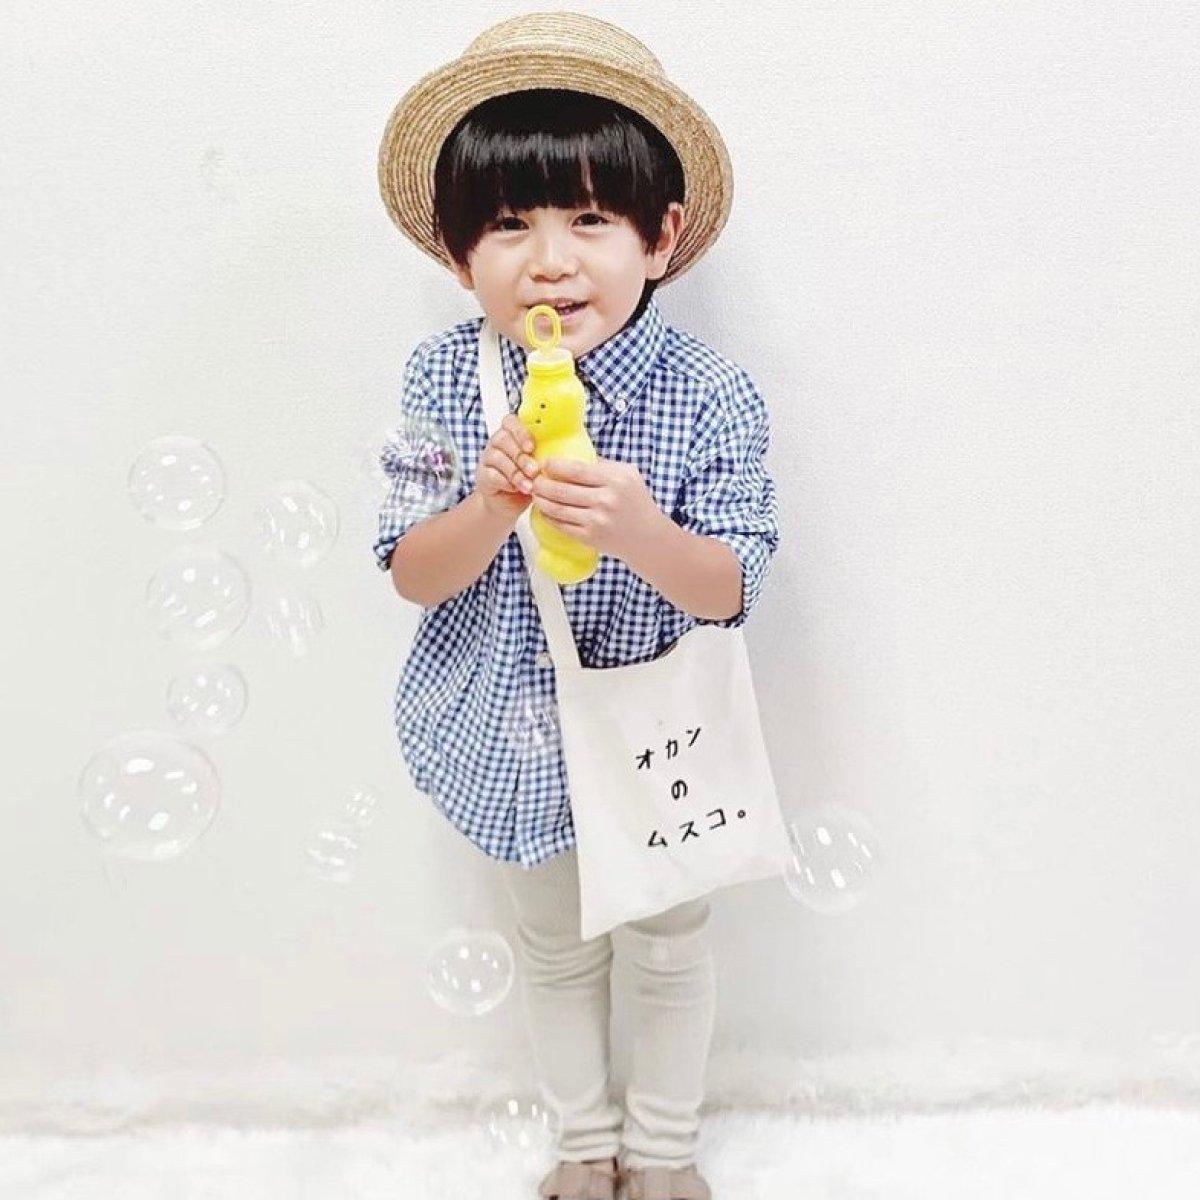 Cotton HF Sacoche(親子シリーズ) 詳細画像17